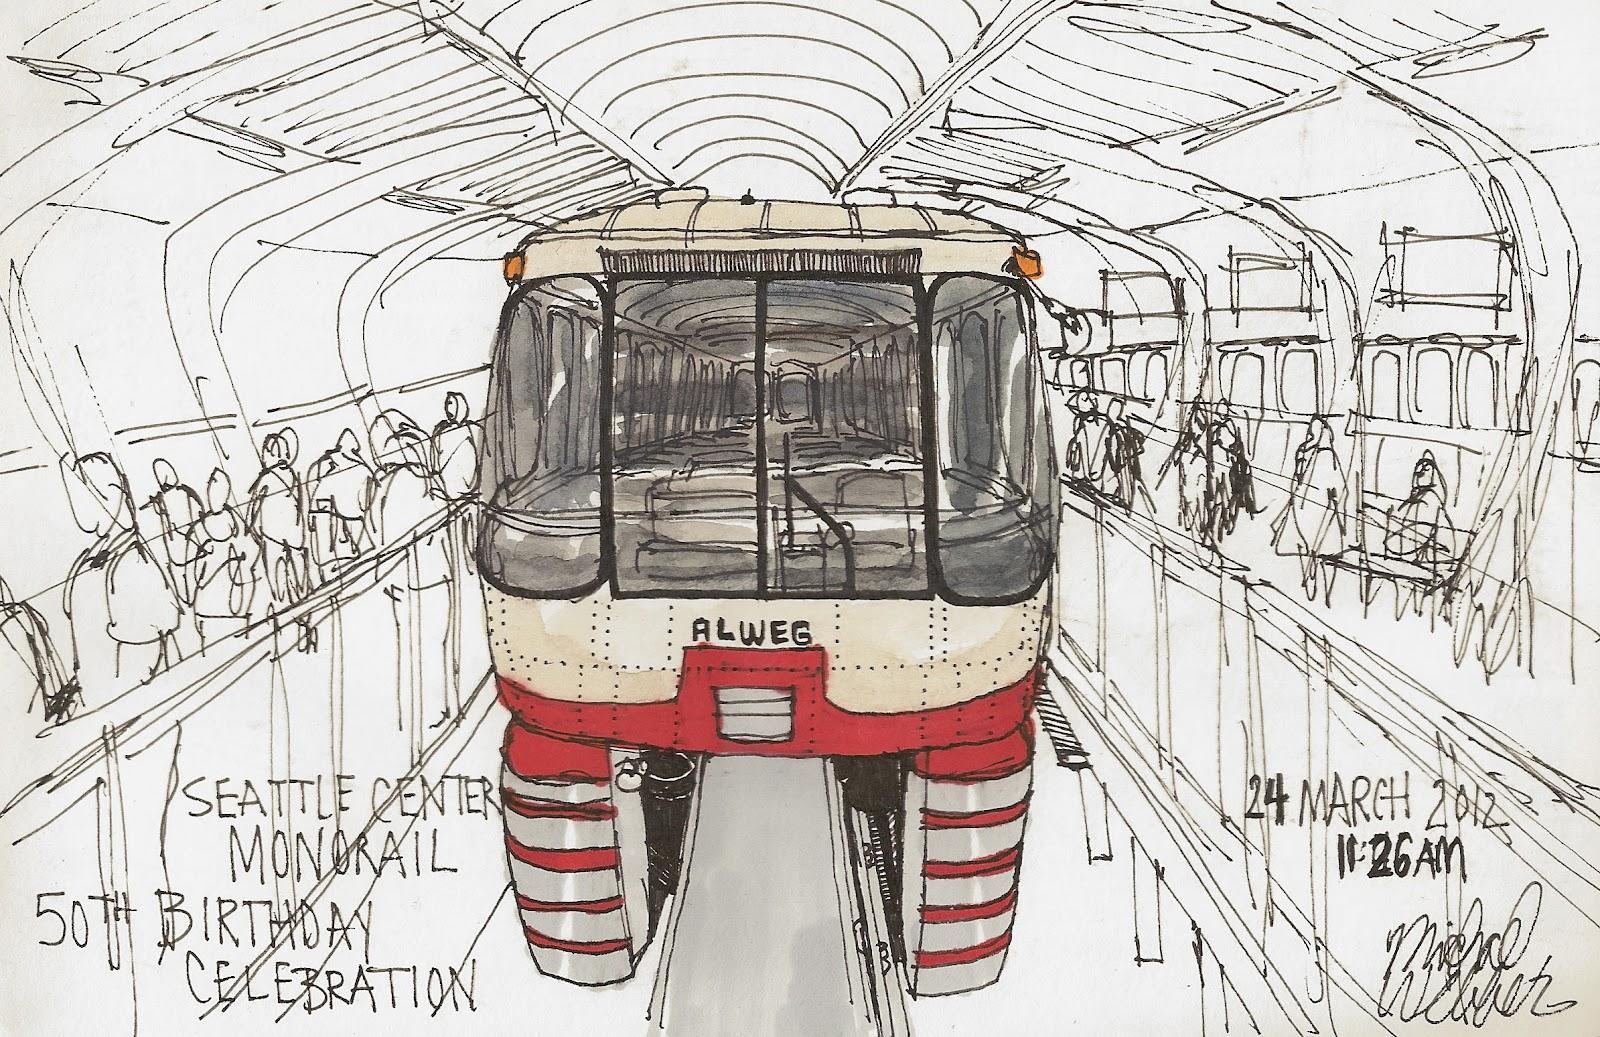 1600x1037 Urban Sketchers Seattle Seattle Center Monorail